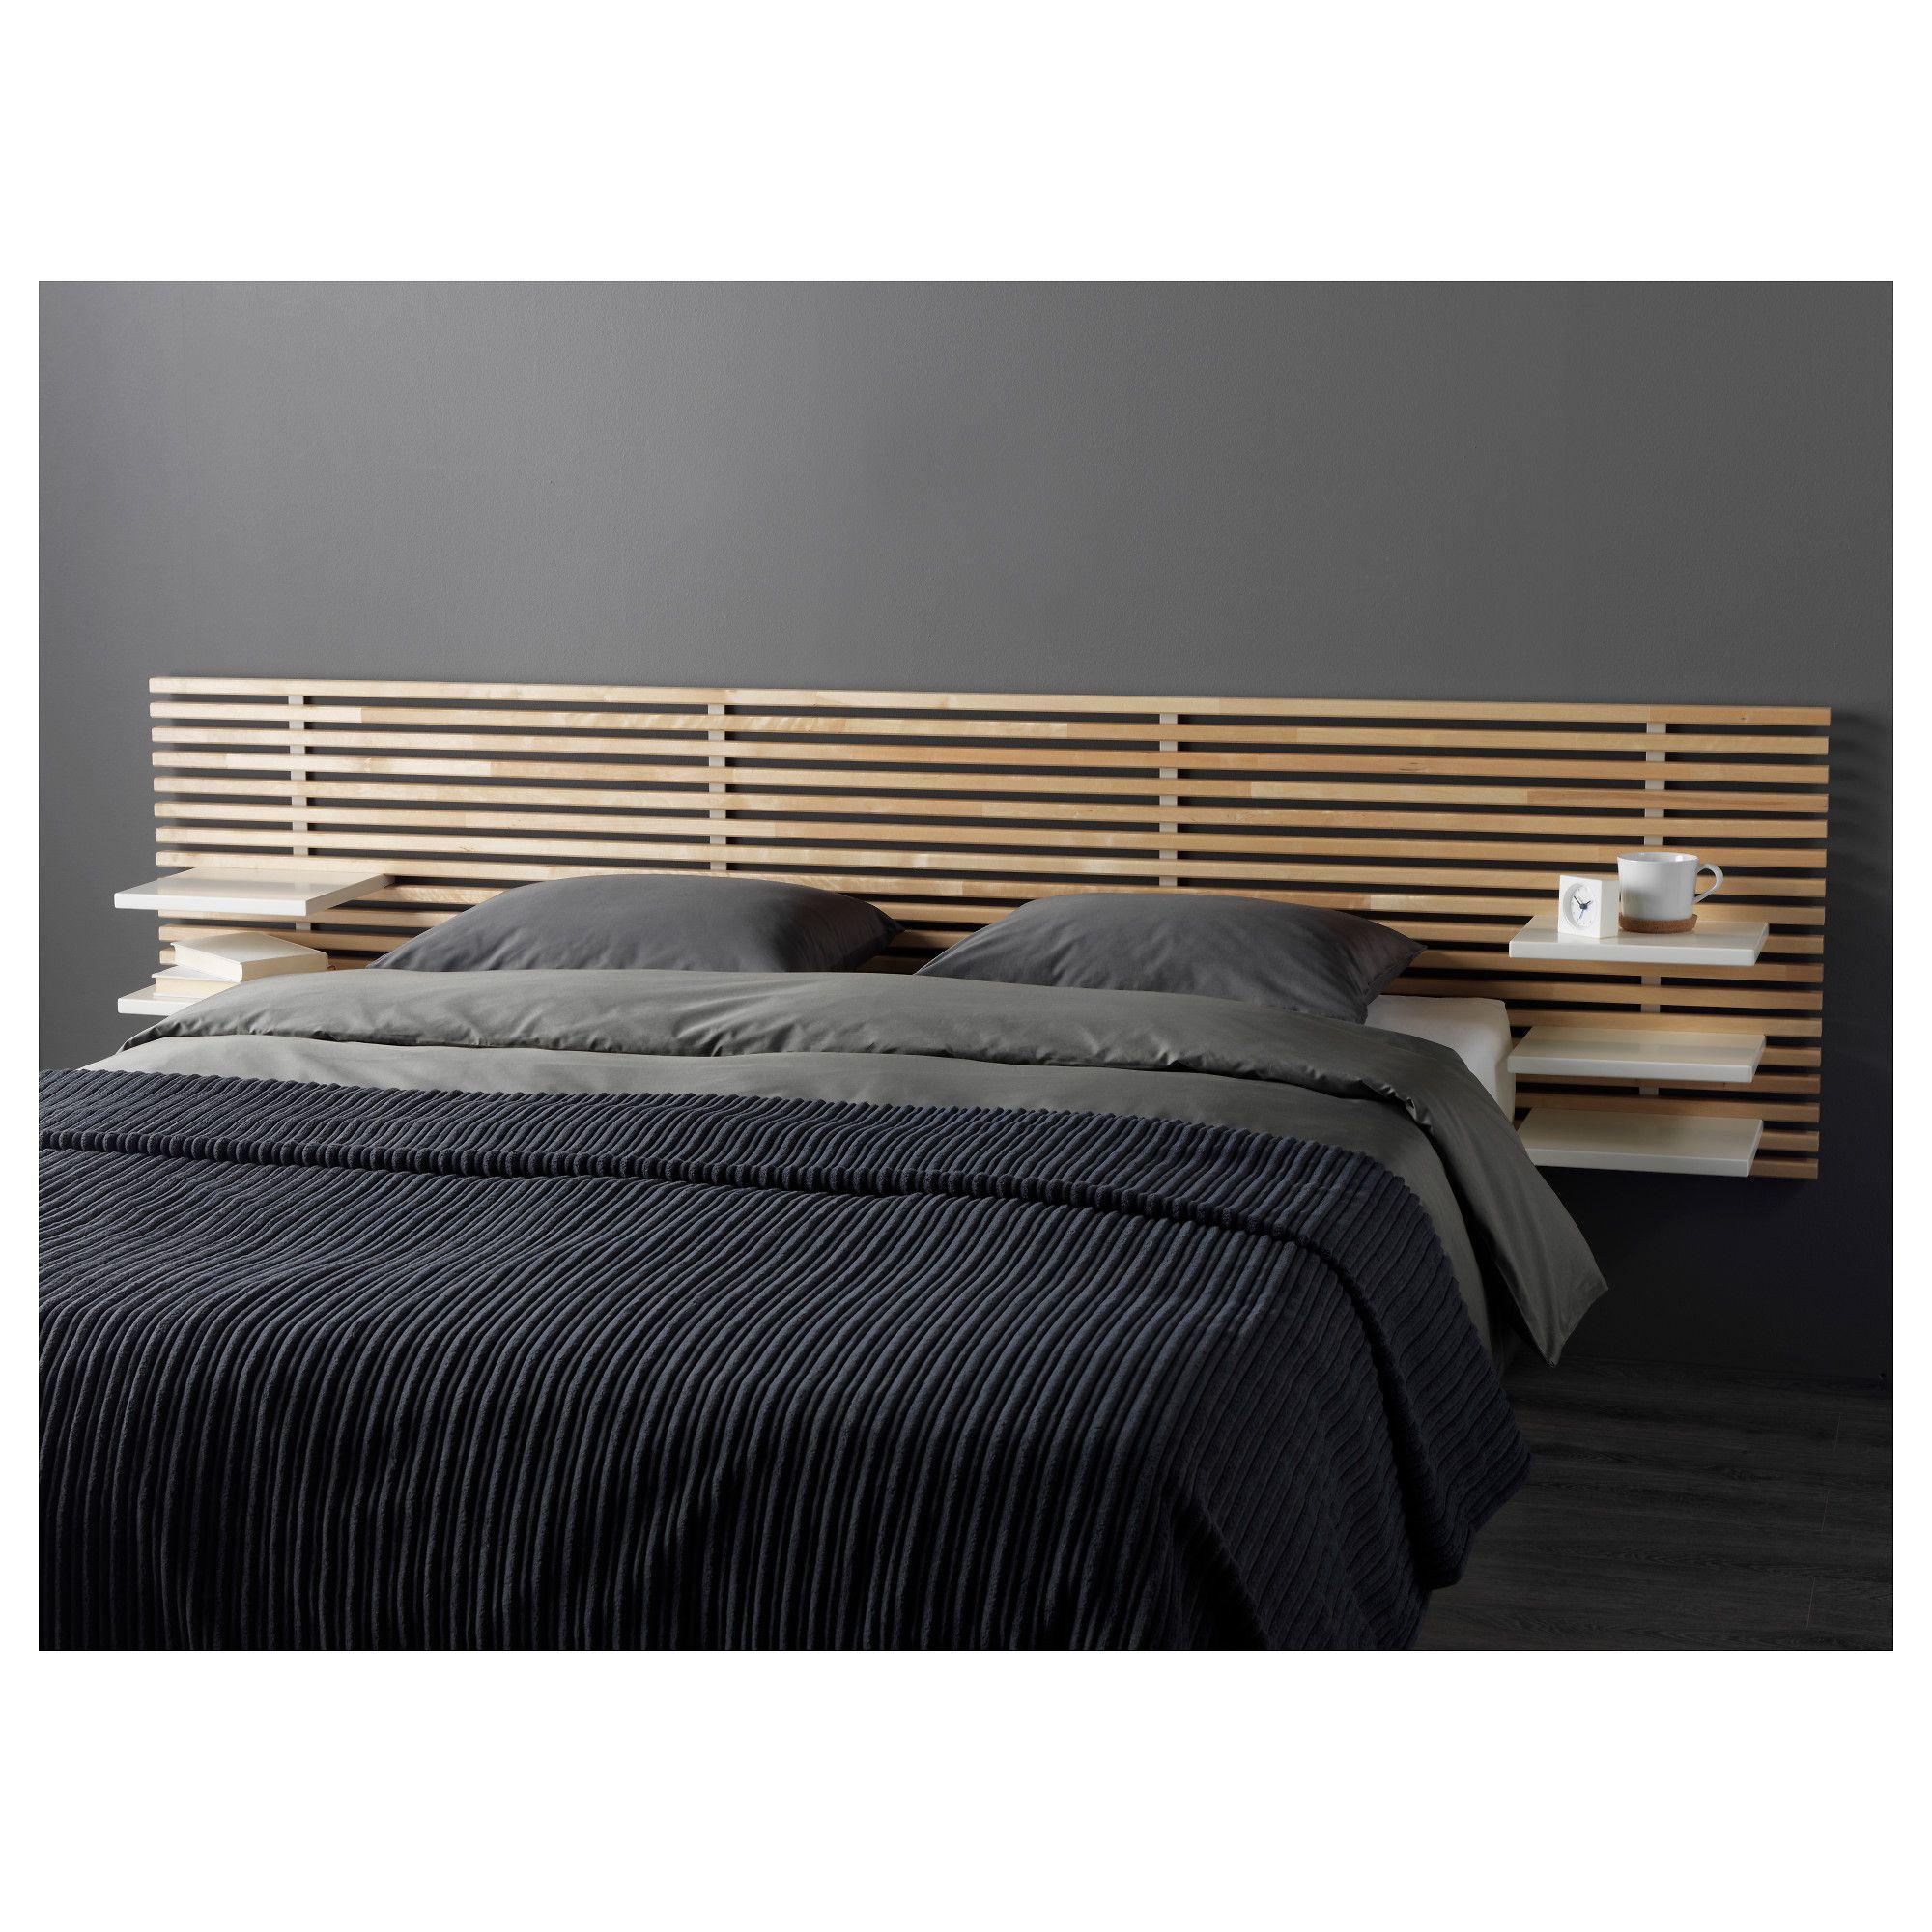 Ikea Us Furniture And Home Furnishings Ikea Mandal Headboard